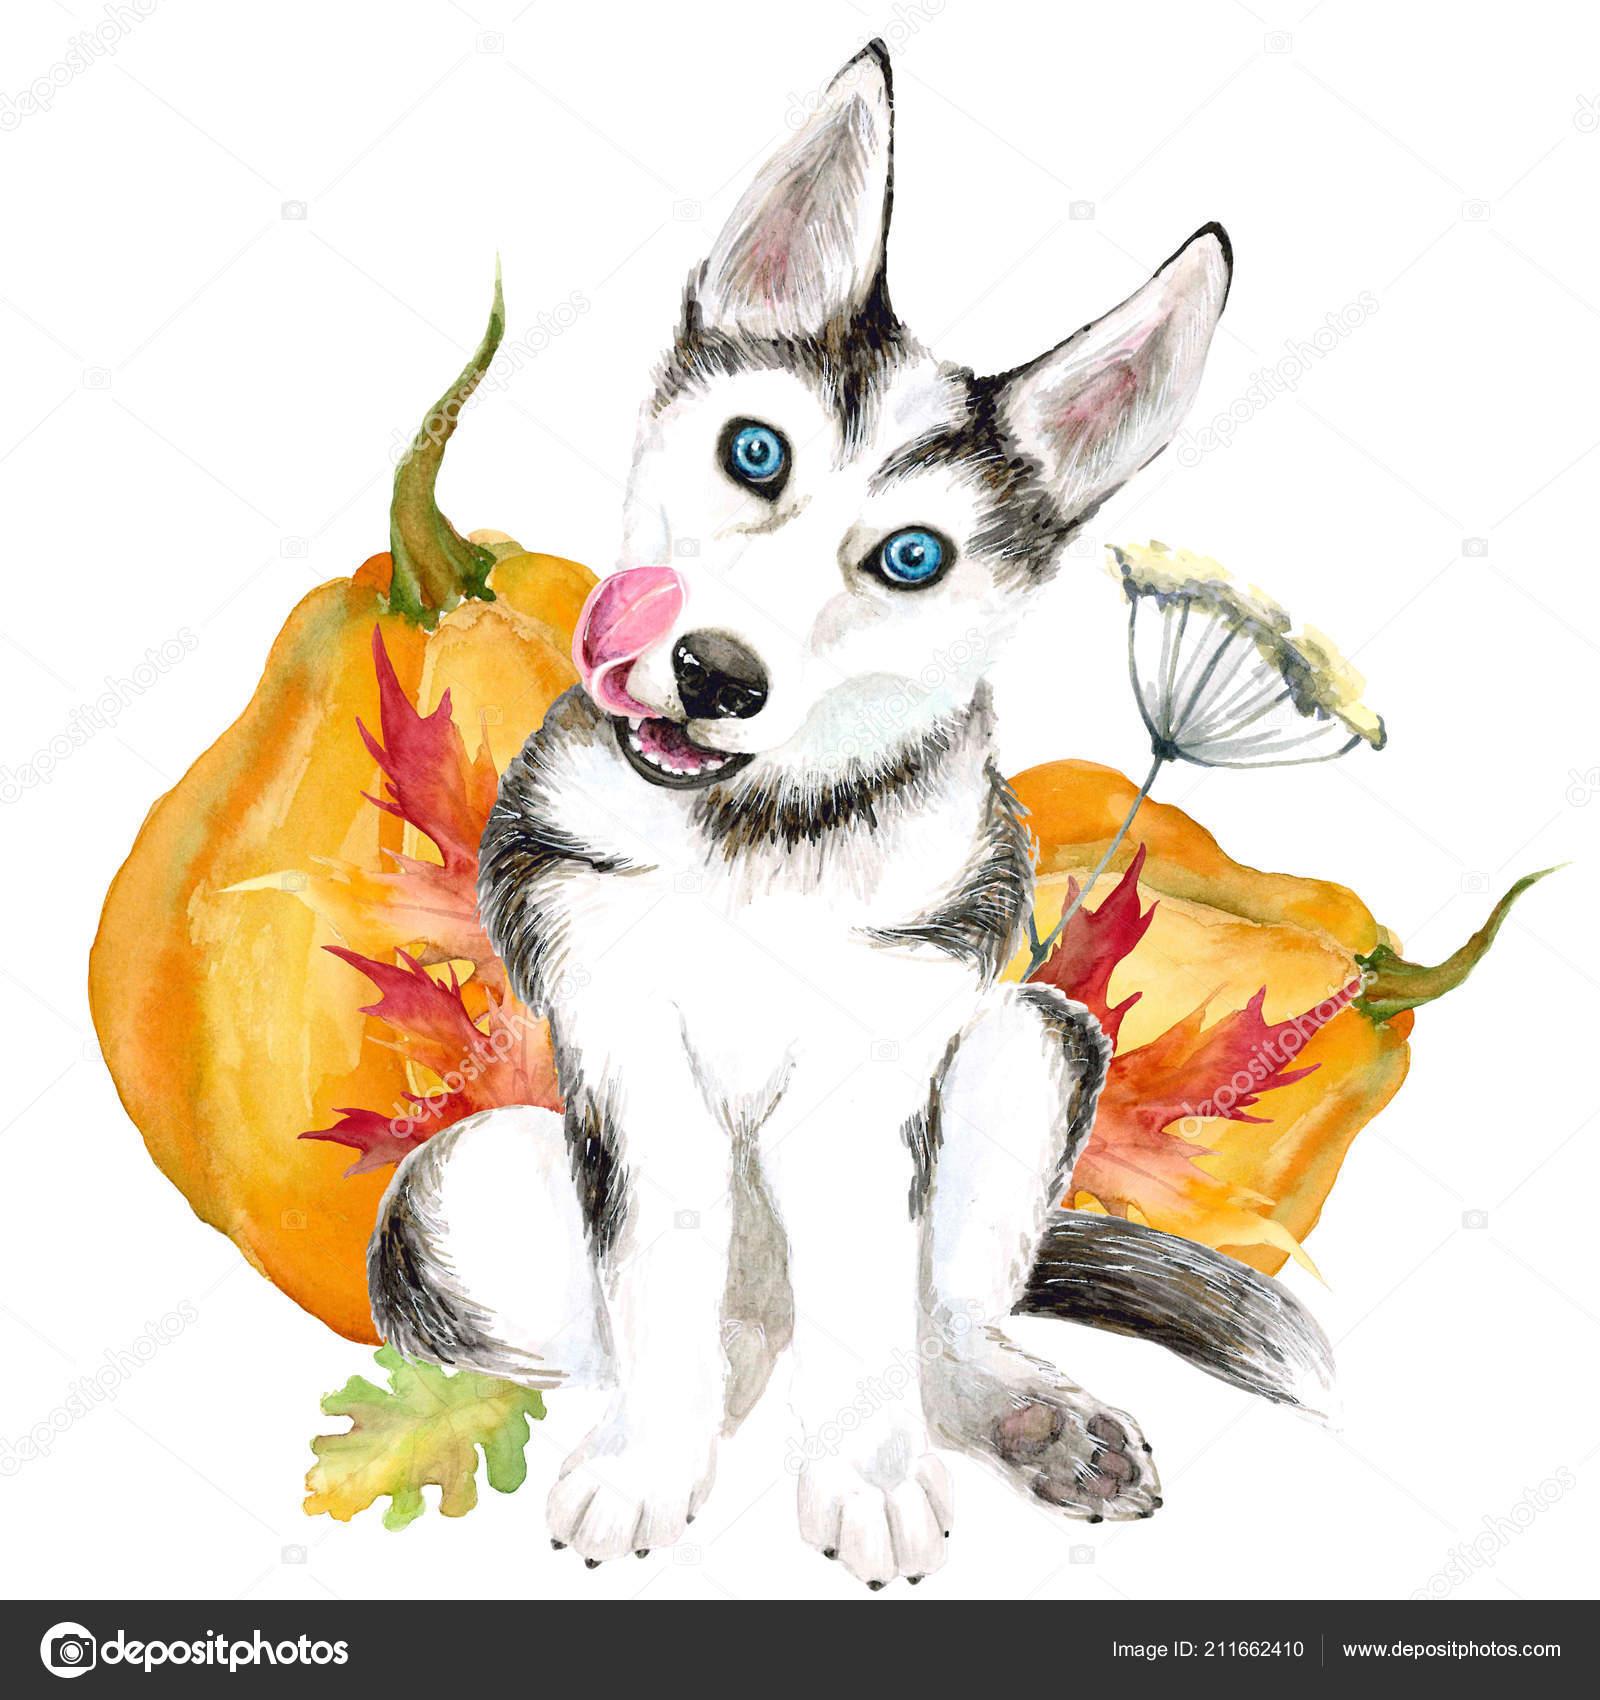 The Dog Breeds Husky Cute Puppy With Blue Eyes Isolated On White Background Autumn Harvest Pumpkin Stock Photo C Katyazverek 211662410